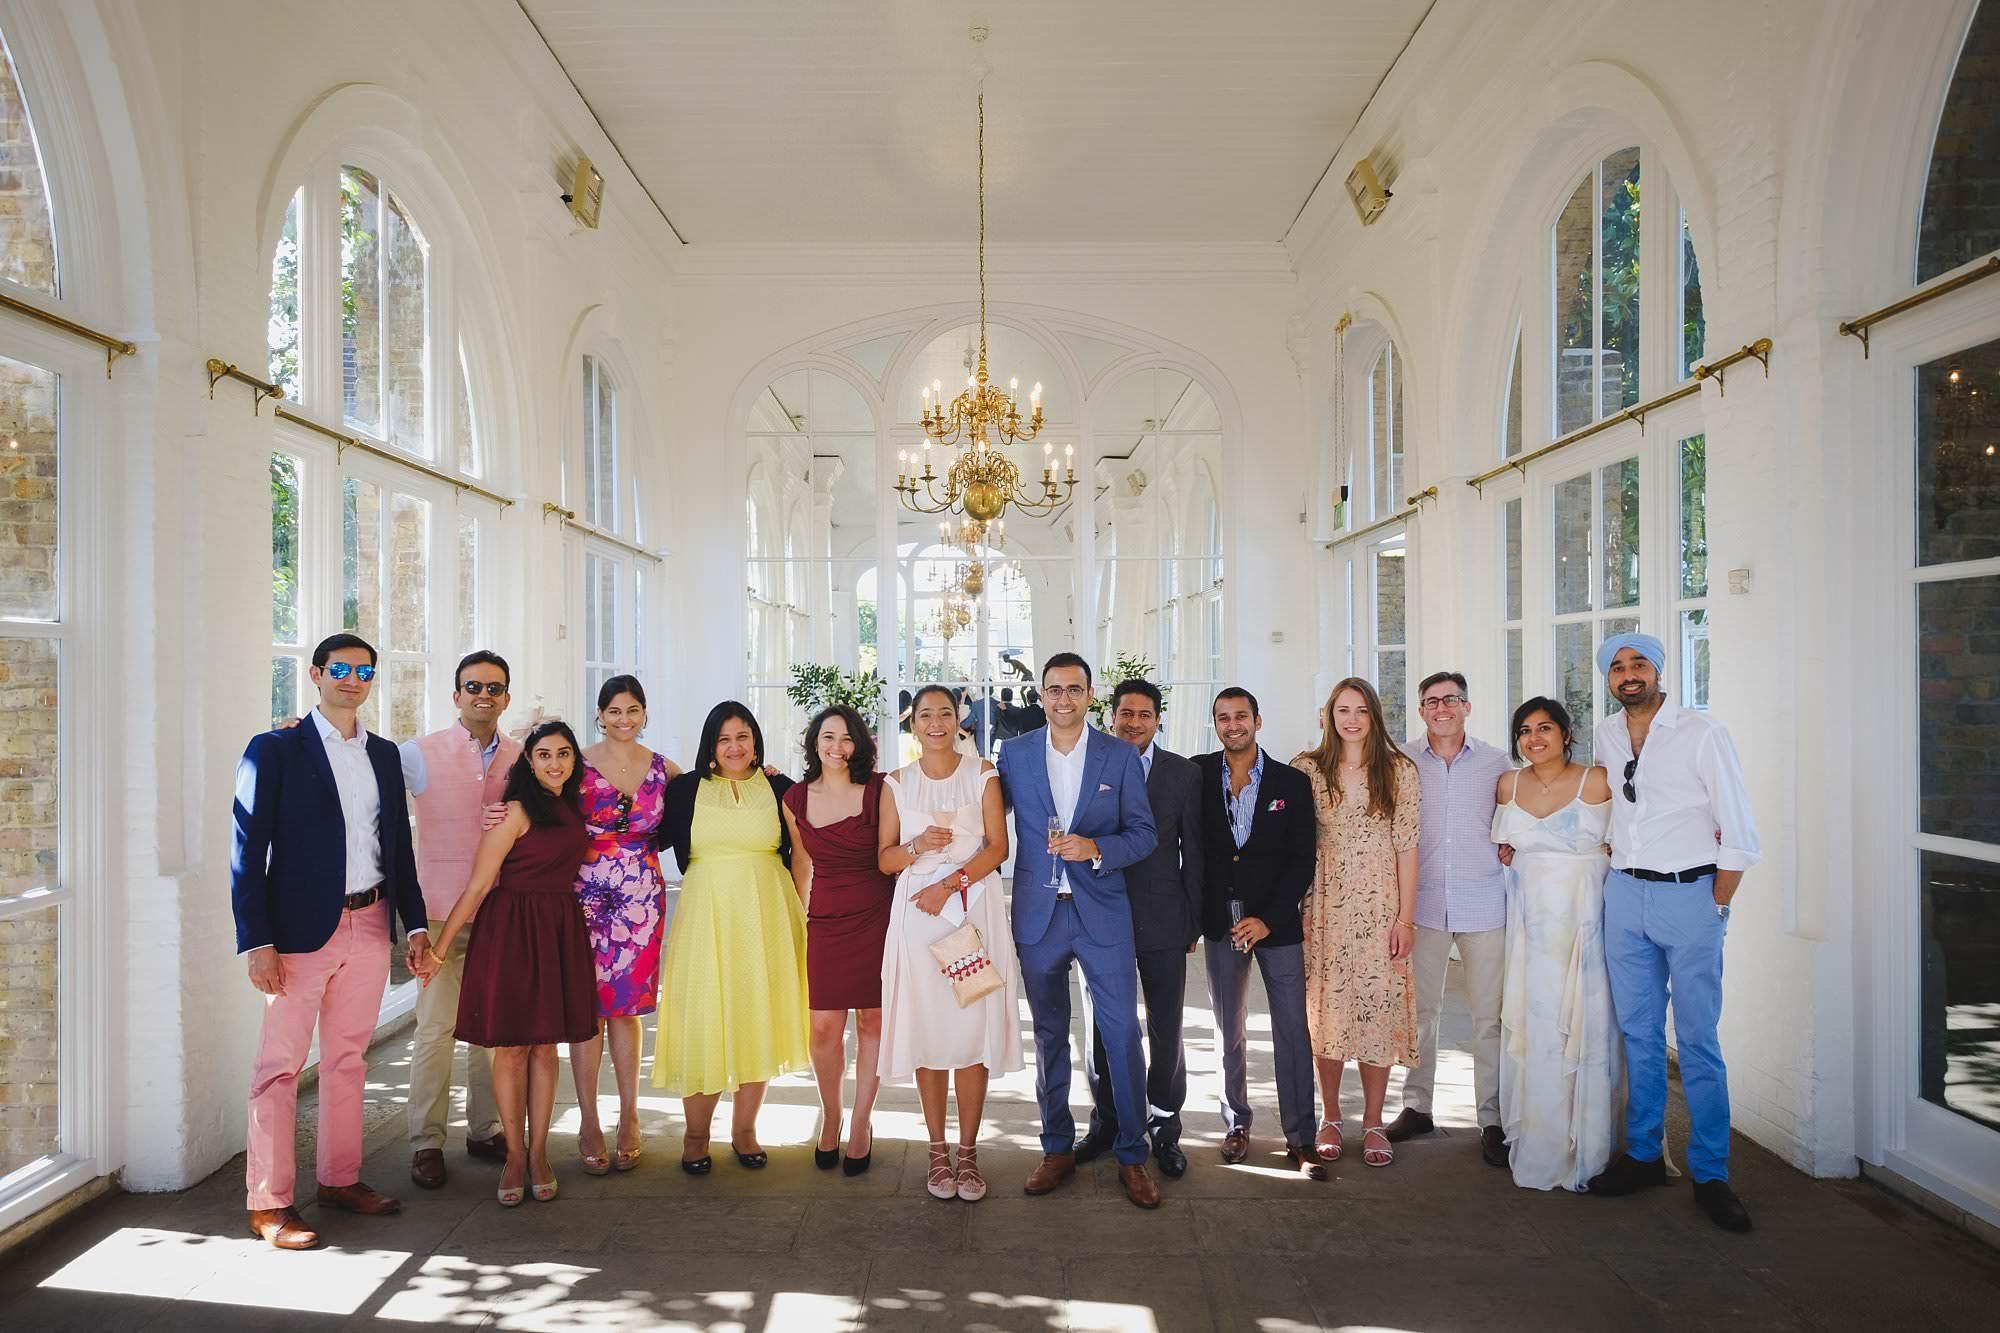 orangery holland park wedding reception 030 - Holland Park Orangery Wedding Photographer | Ayesha & Ritam